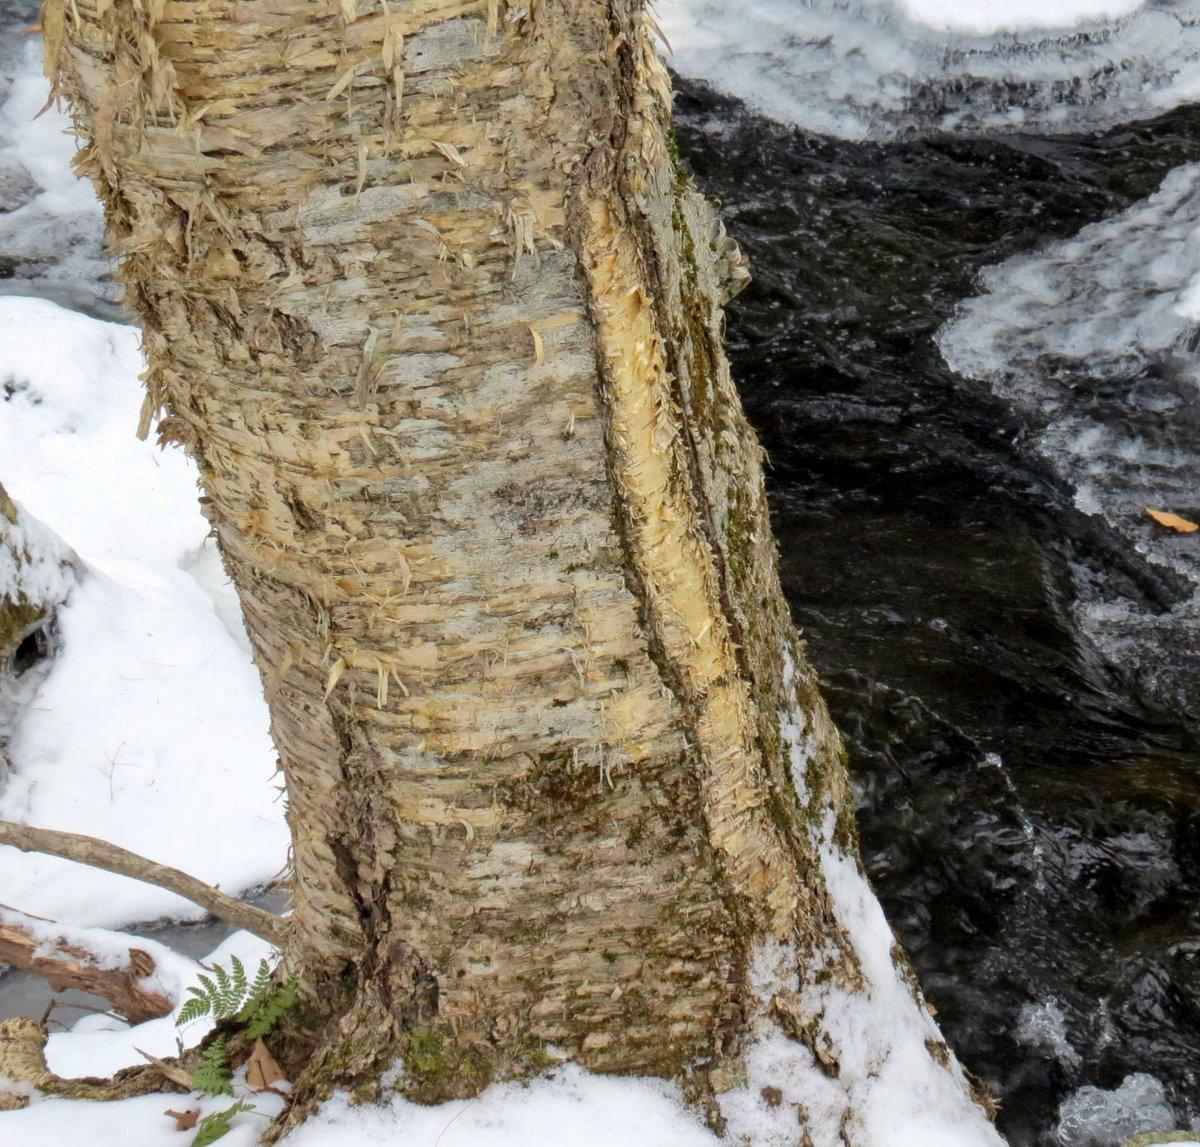 9. Frost Crack on Birch